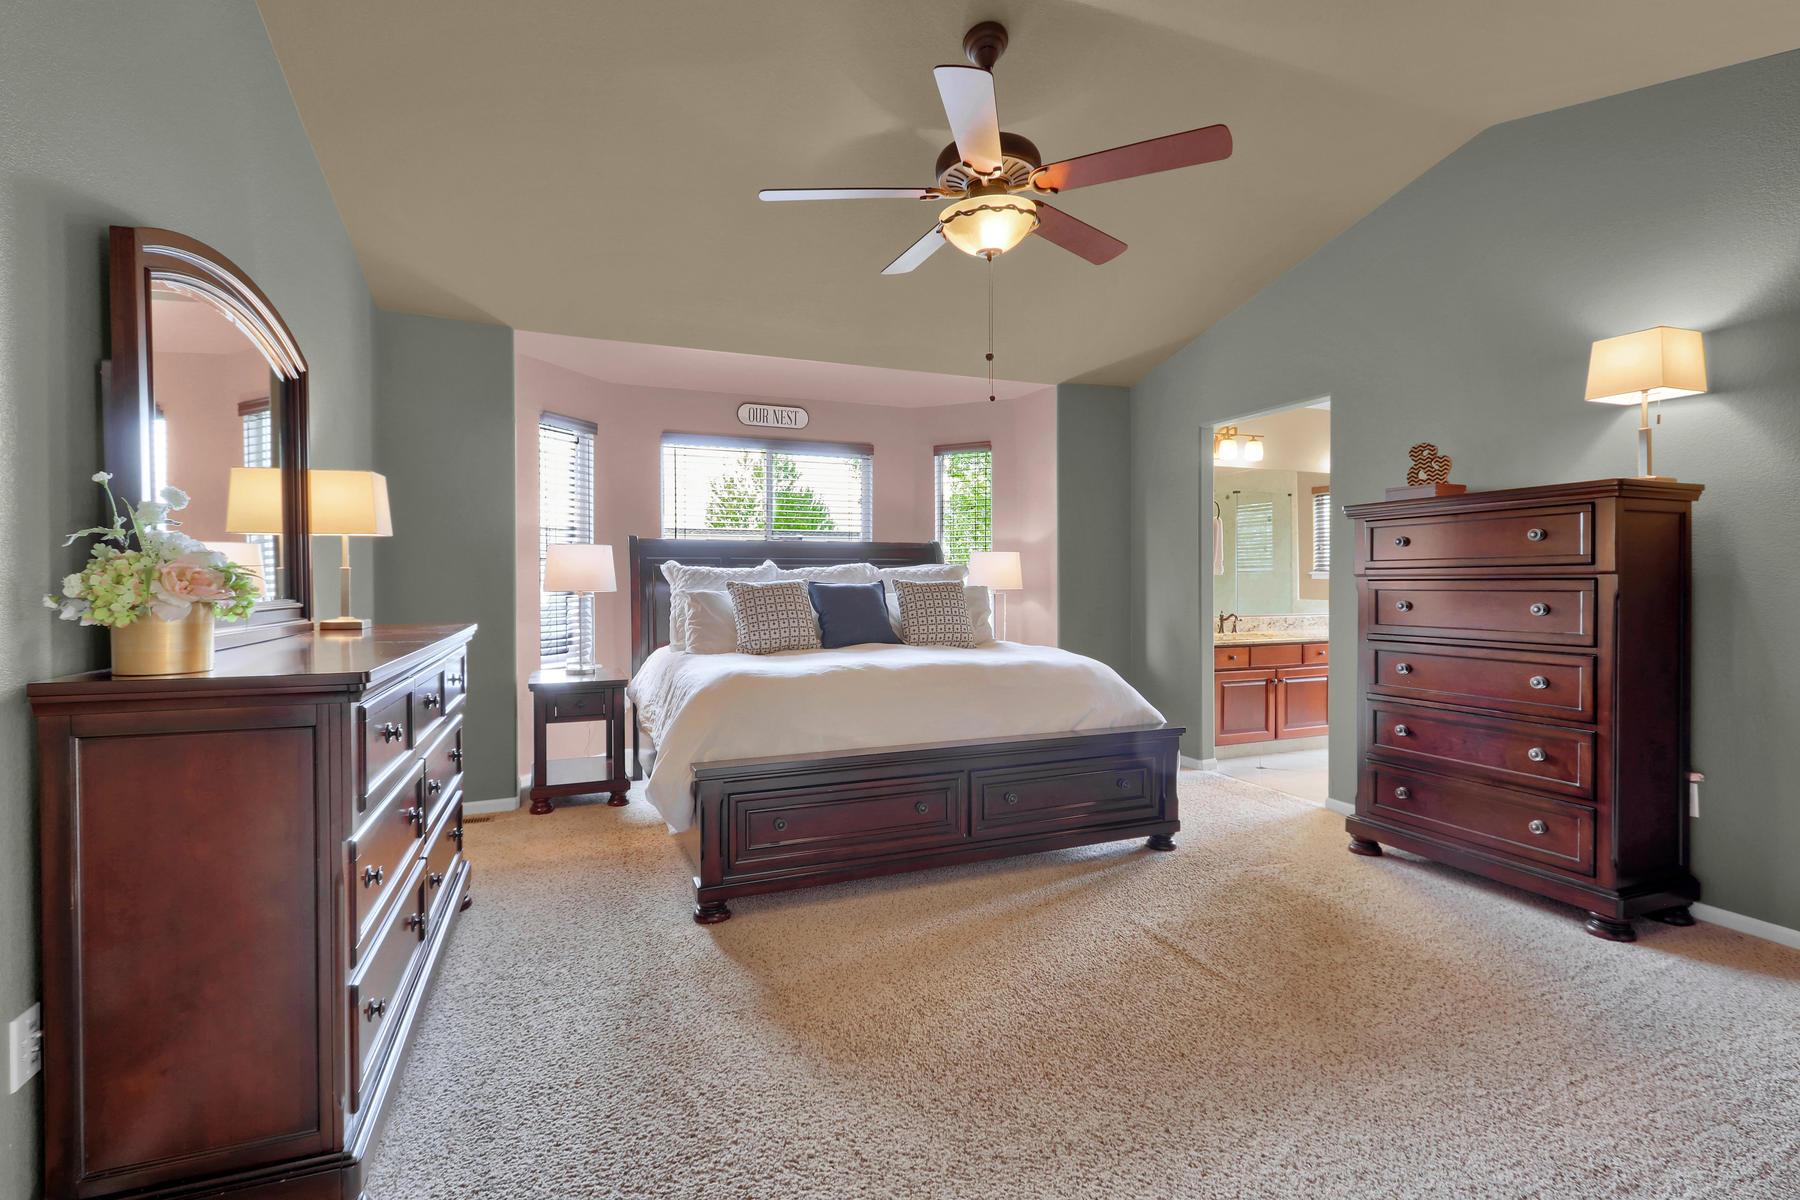 13433 W 62nd Pl Arvada CO-024-23-Bedroom-MLS_Size.jpg